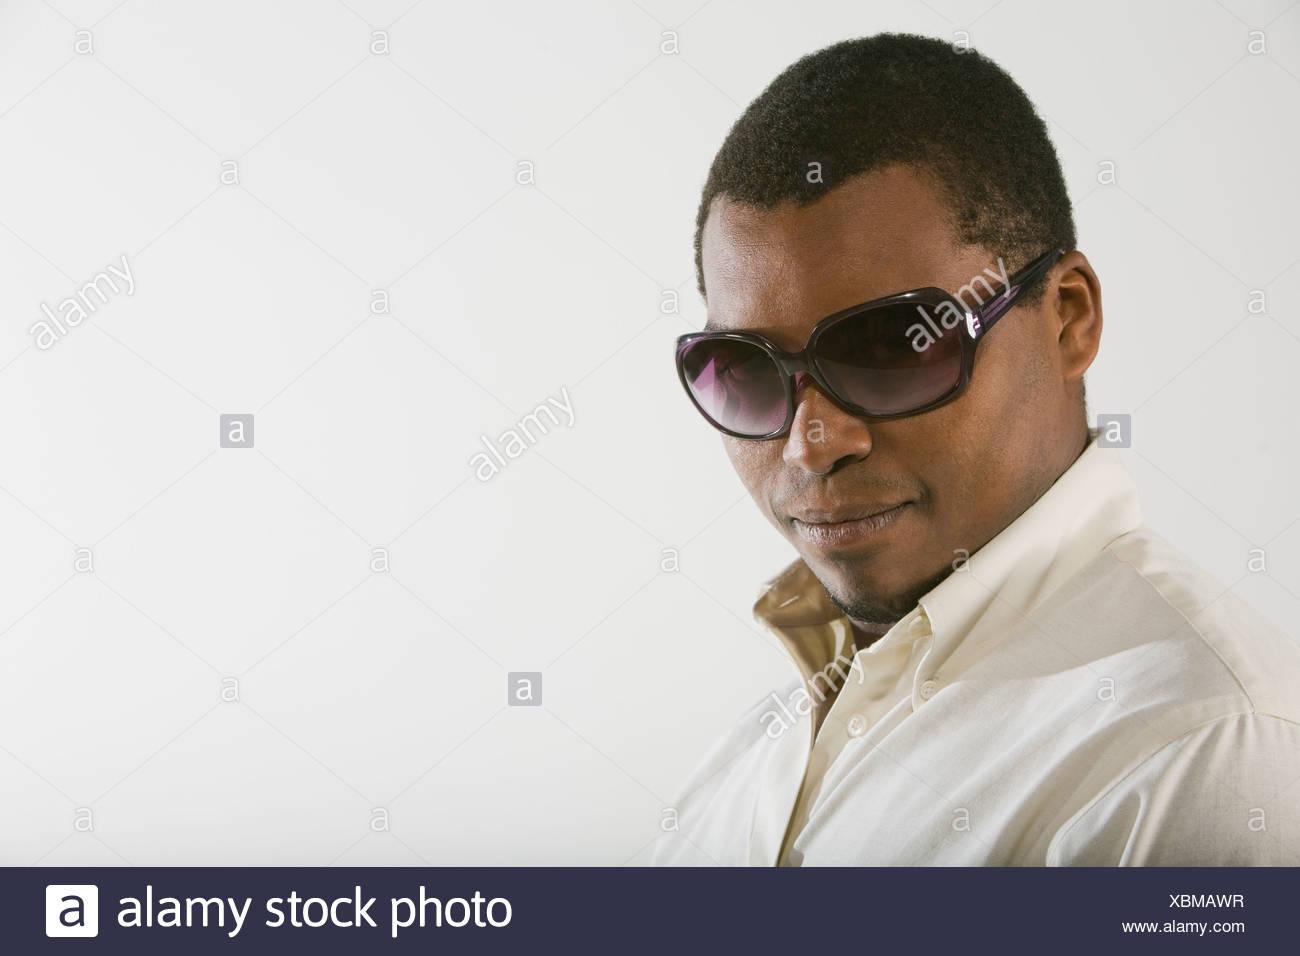 b93cb138e198 Side profile of a mid adult man wearing sunglasses Stock Photo ...